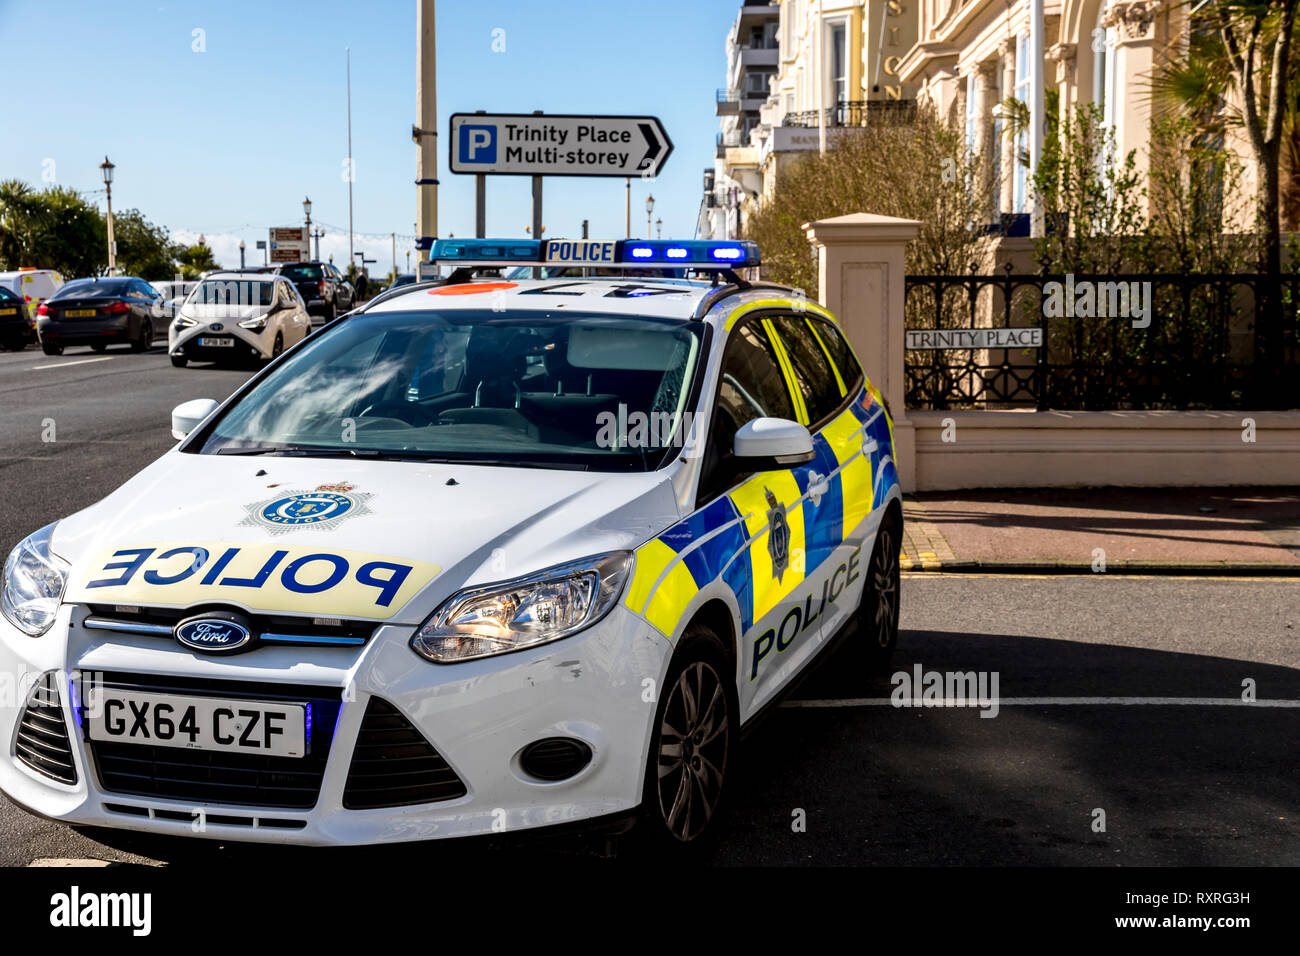 Traffic Policing Stock Photos & Traffic Policing Stock